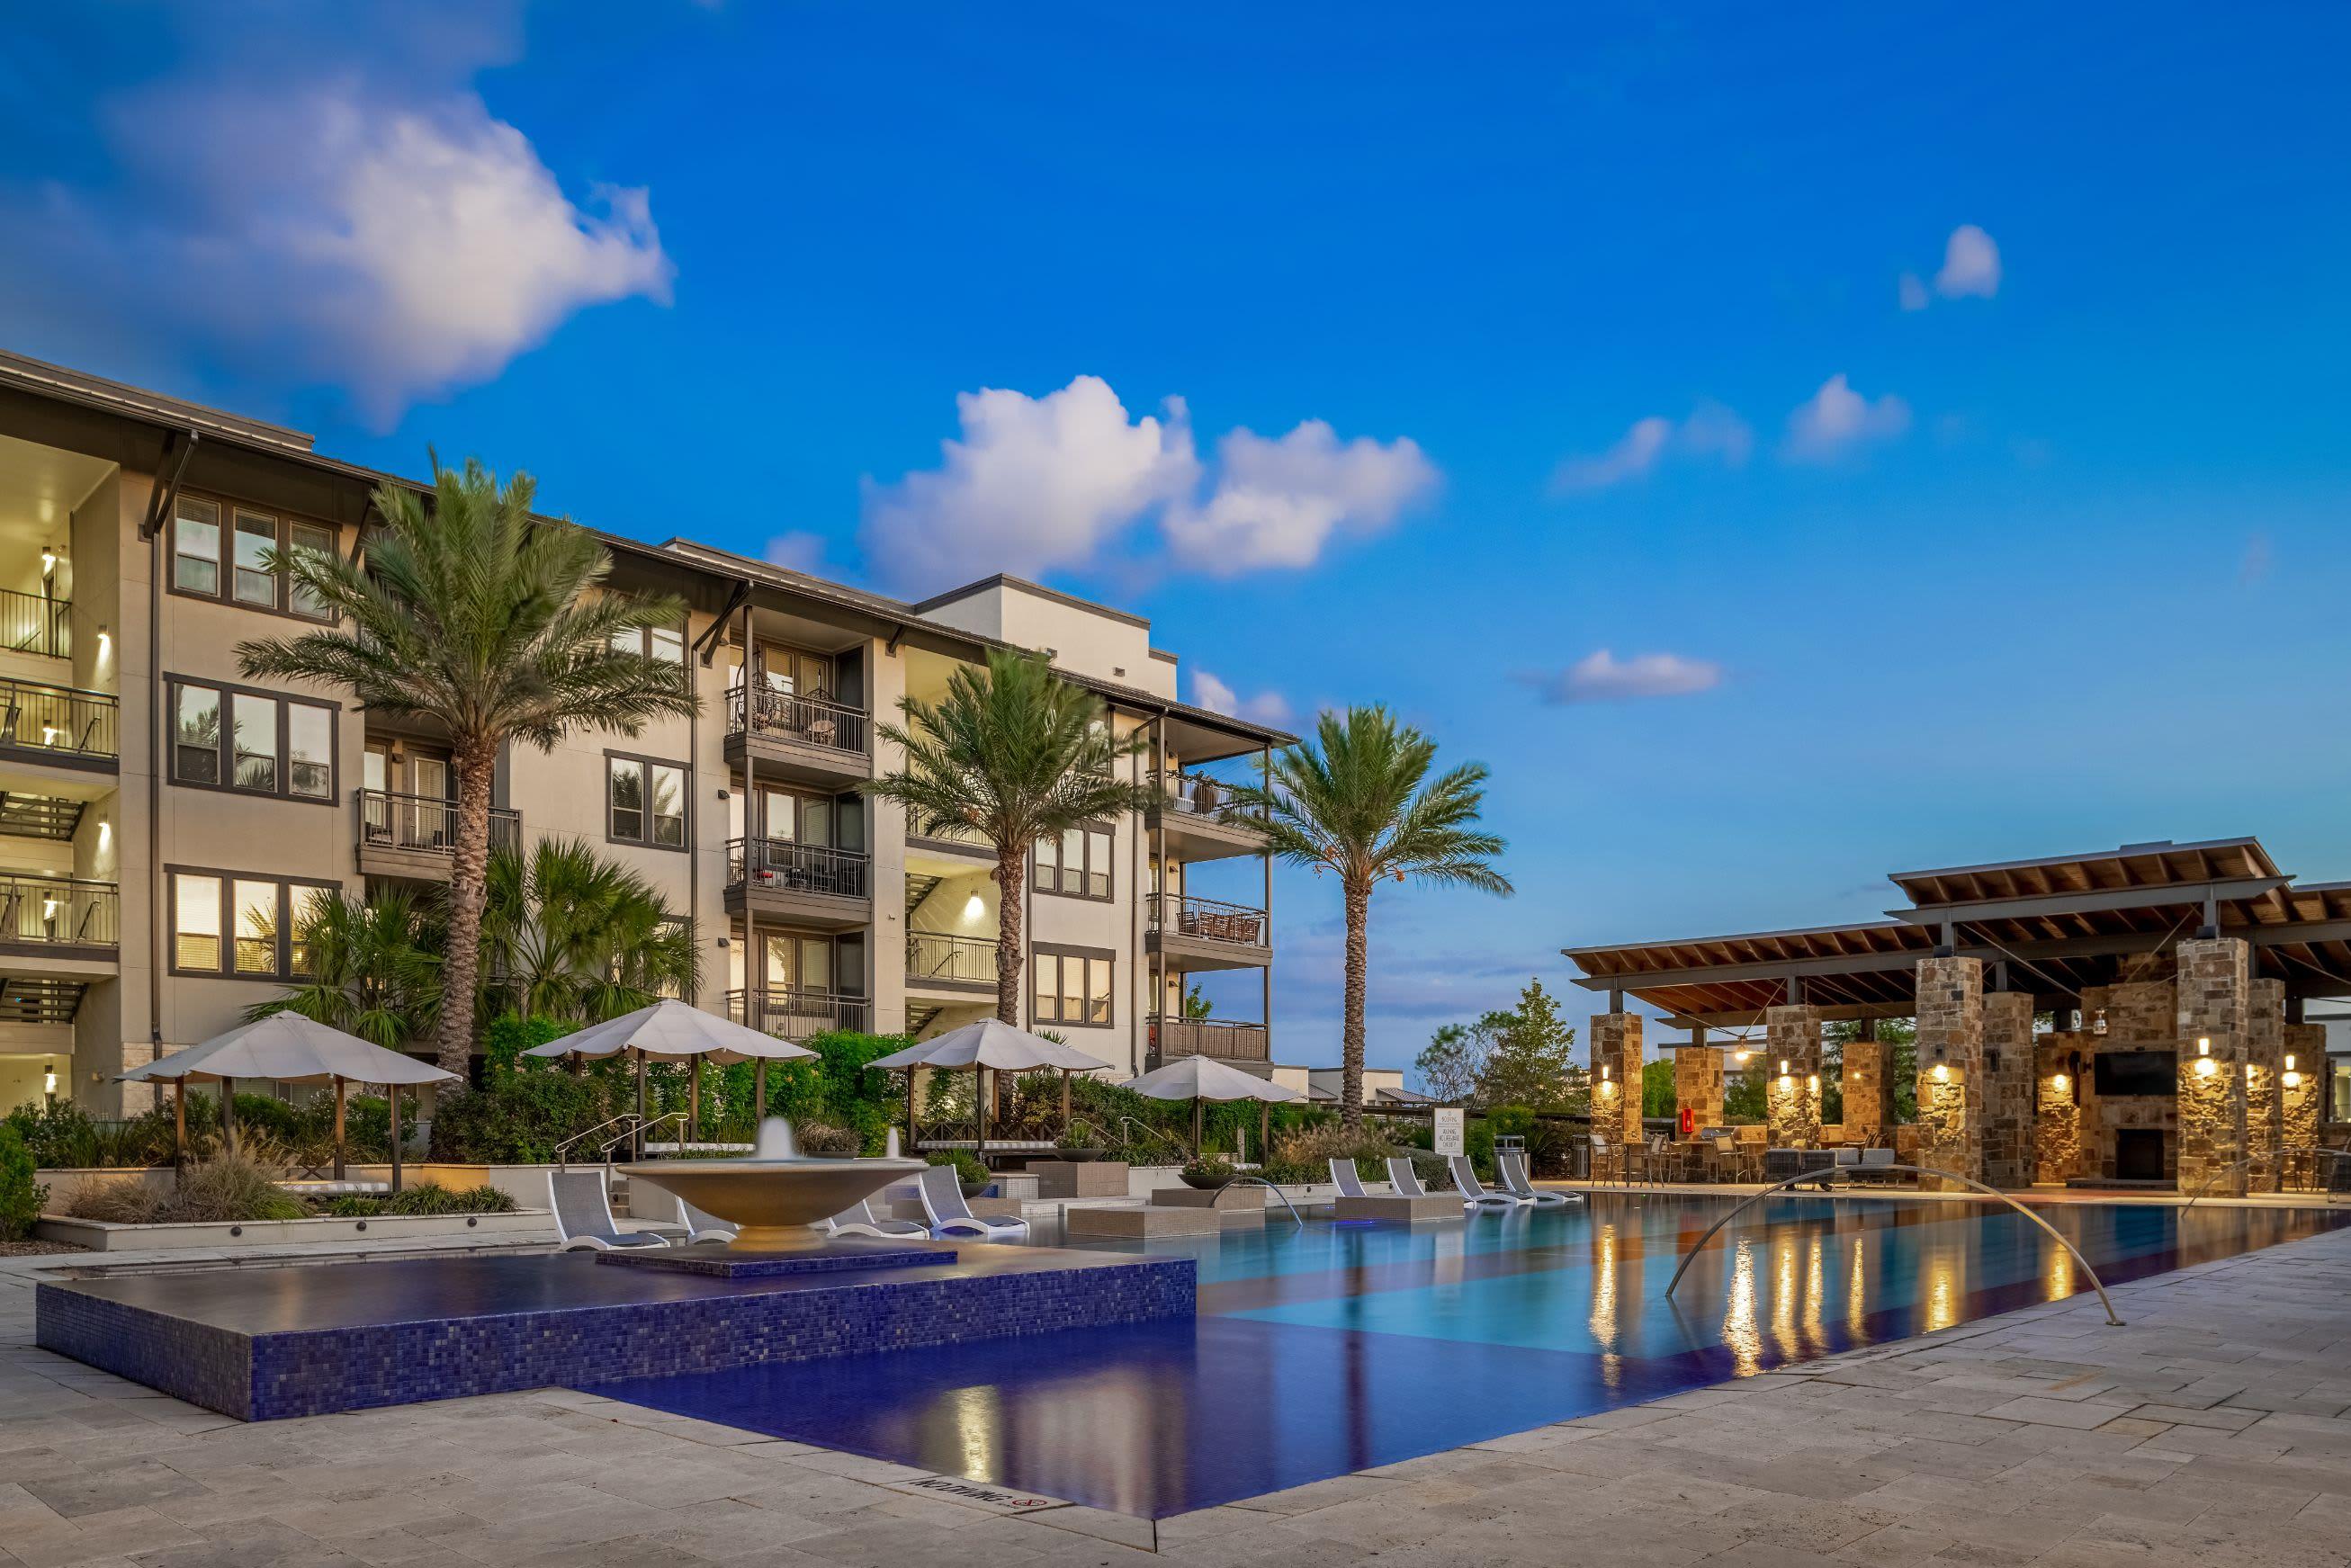 Glistening pool with palm trees San Antonio, Texas from Marquis Cresta Bella